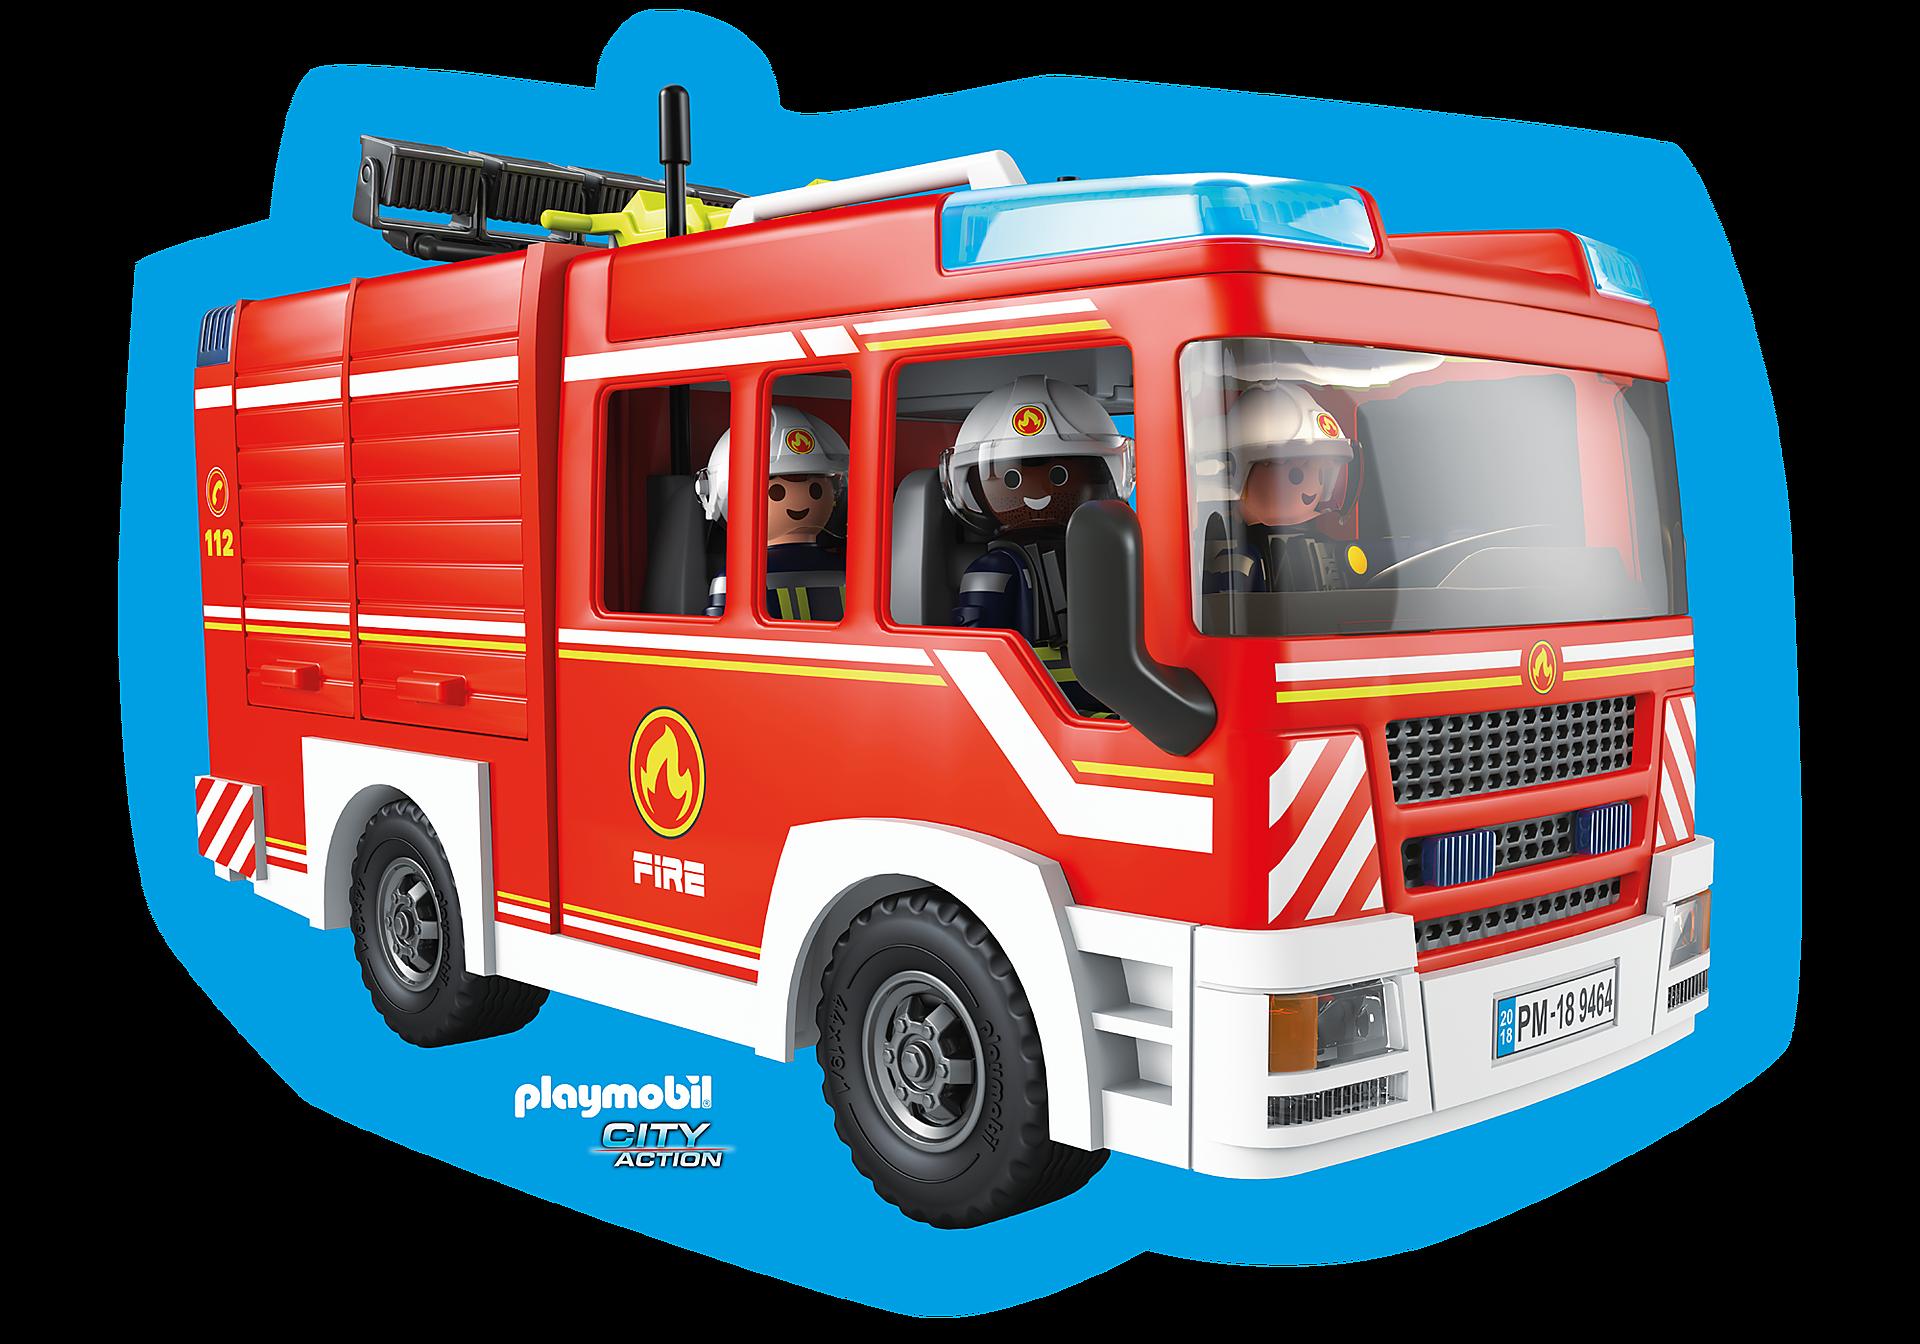 http://media.playmobil.com/i/playmobil/80215_product_detail/Playmobil Kissen Feuerwehr